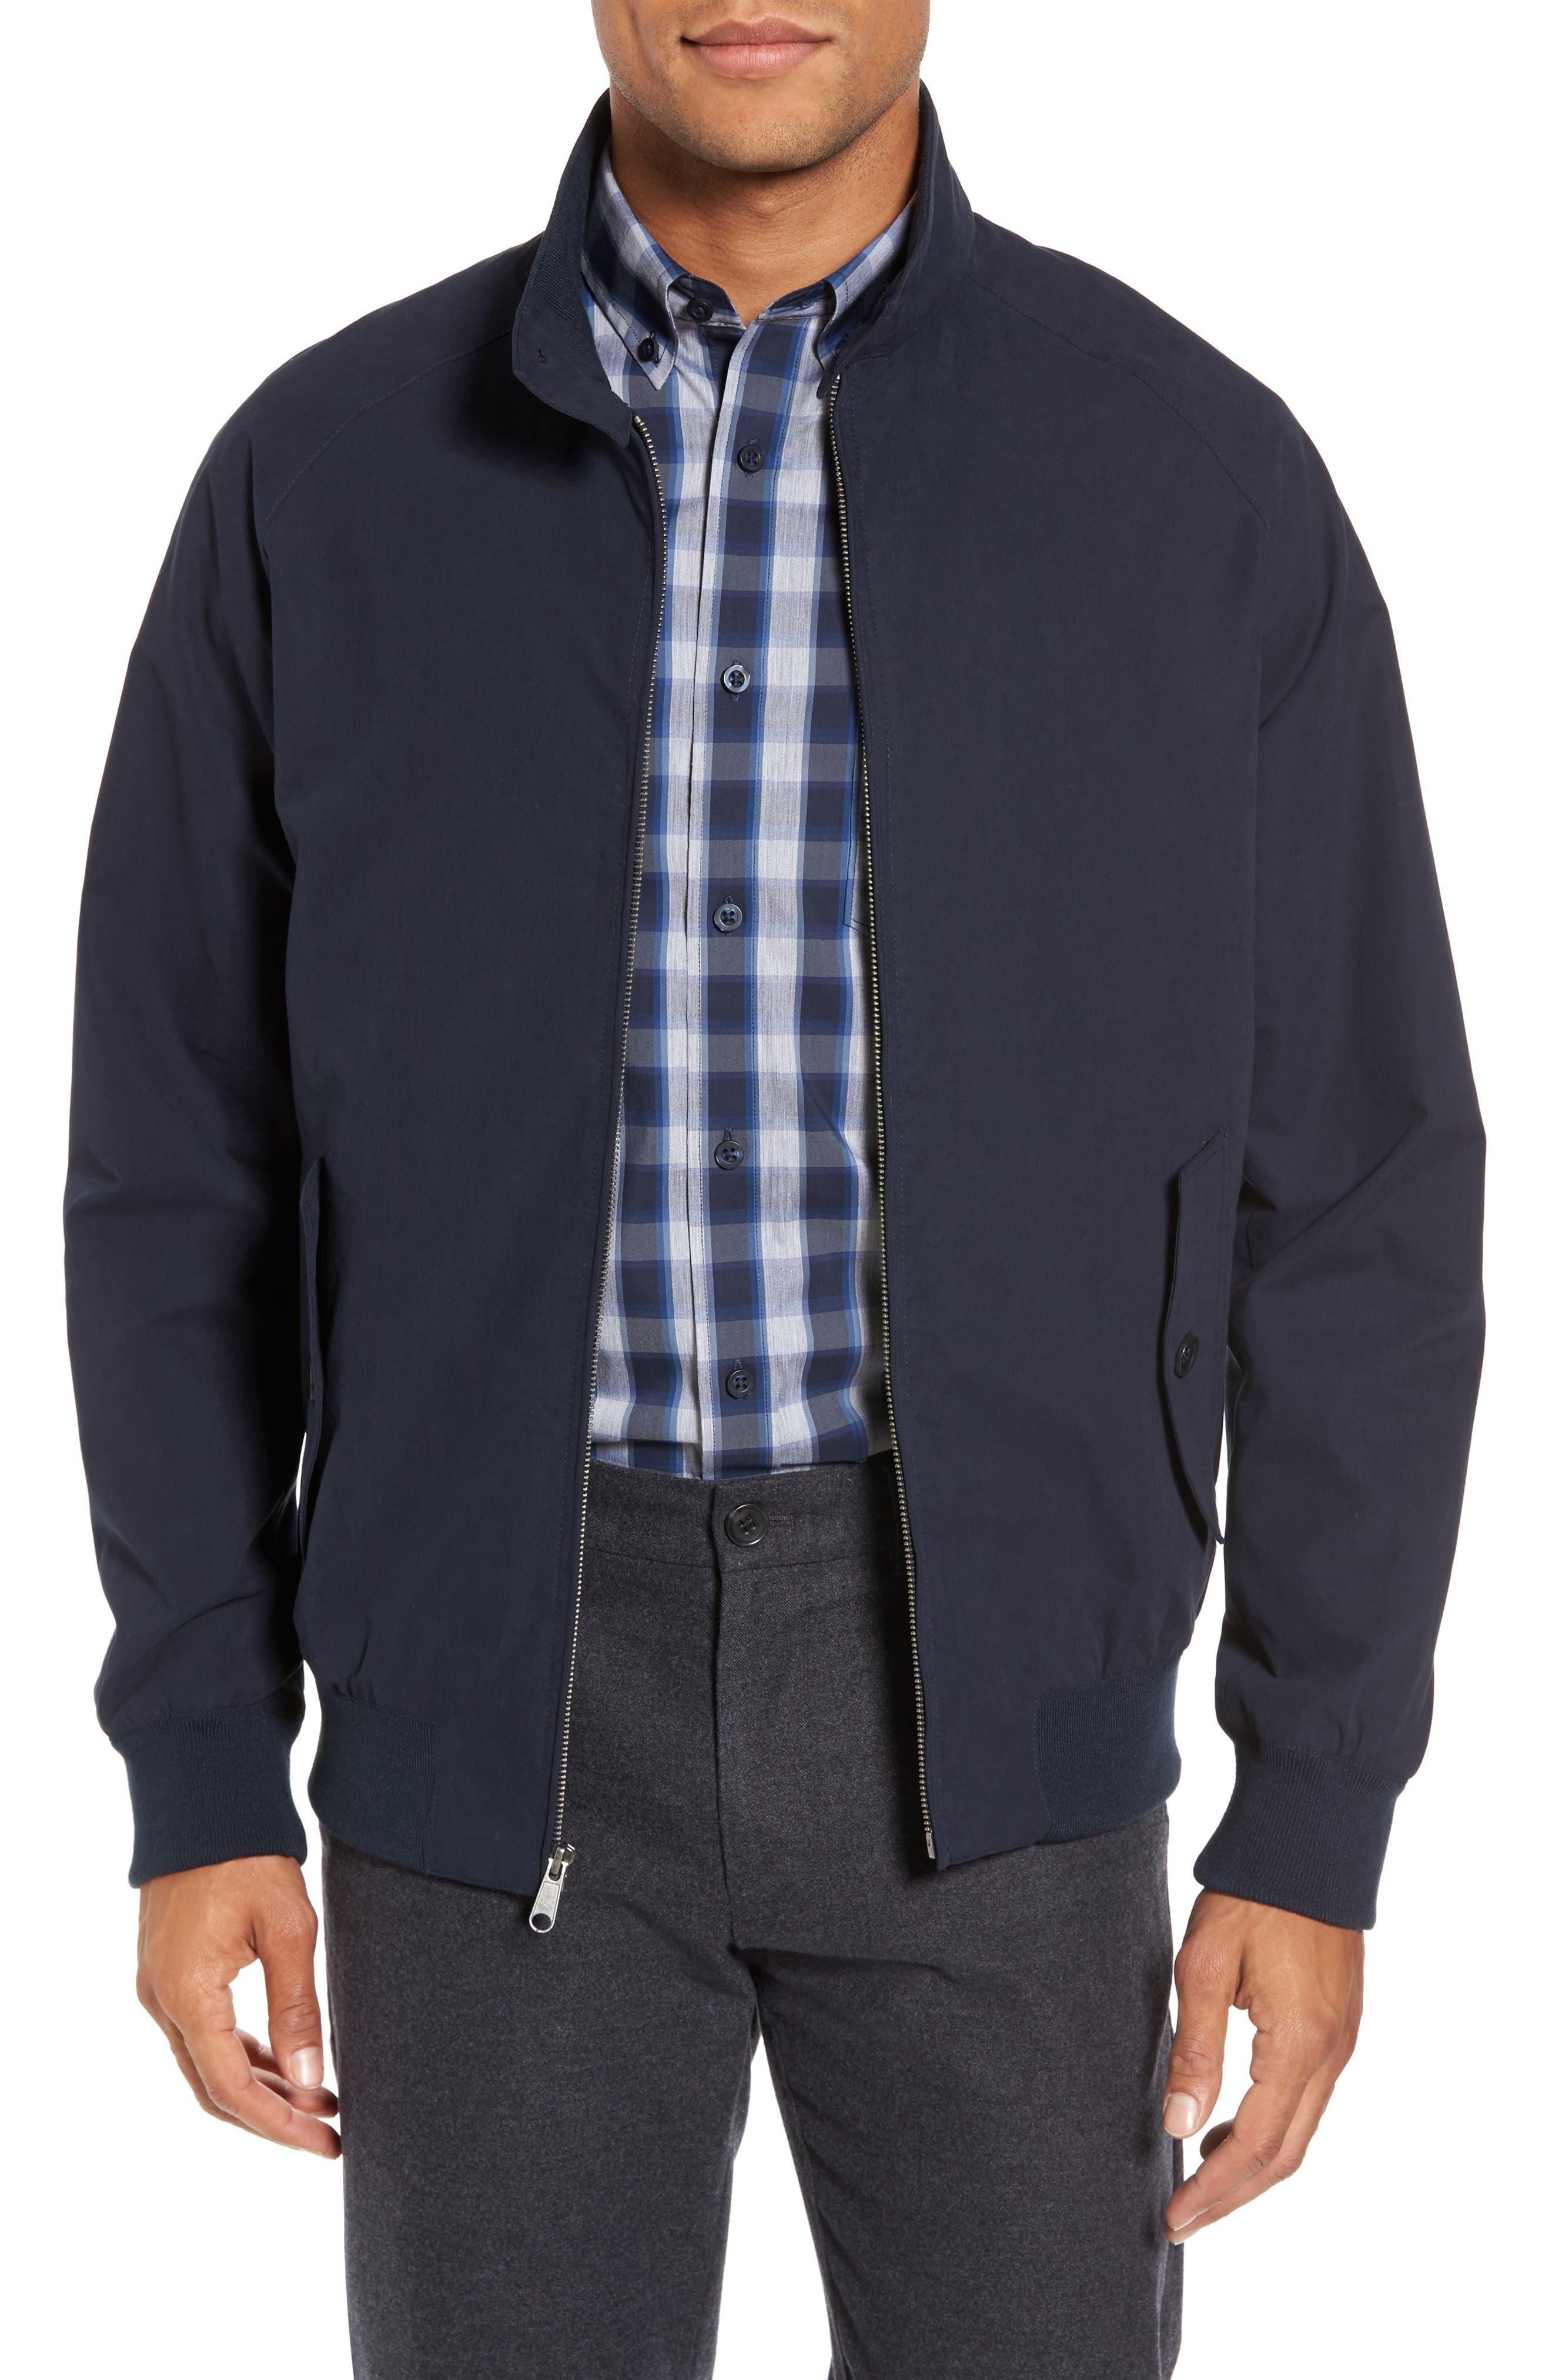 Nordstrom Men's Shop Harrington Bomber Jacket